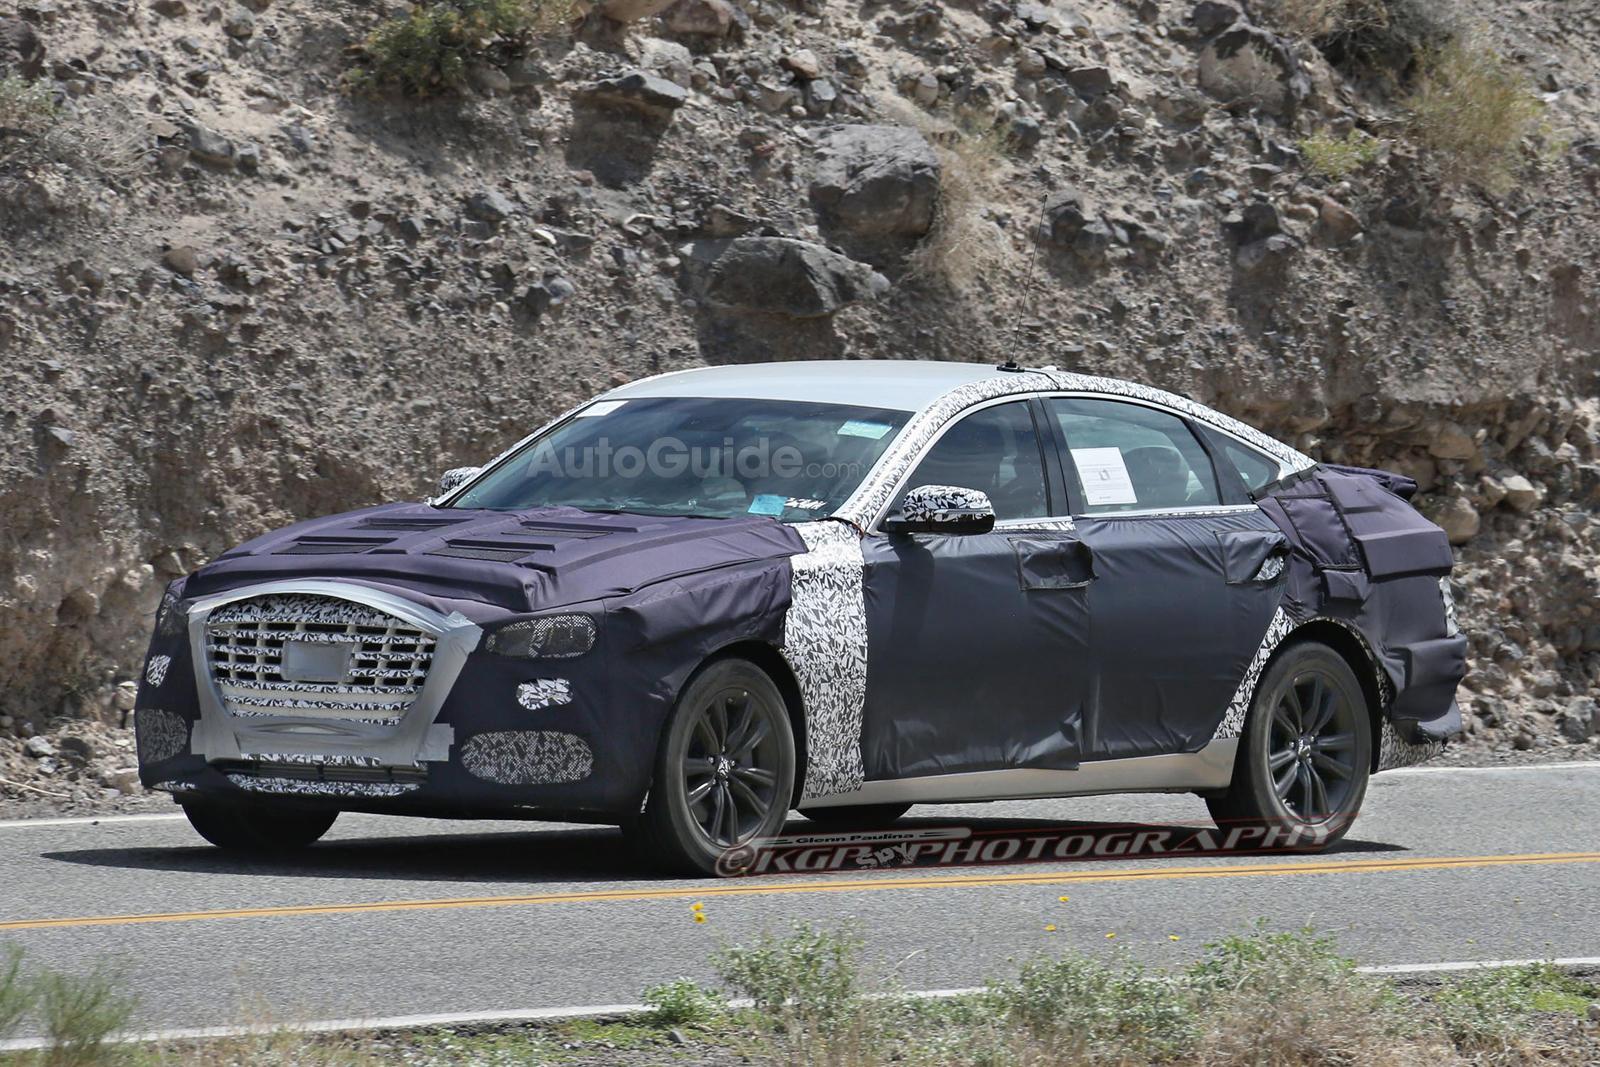 2018 Hyundai Genesis Sedan Caught Testing Twin-Turbo V6